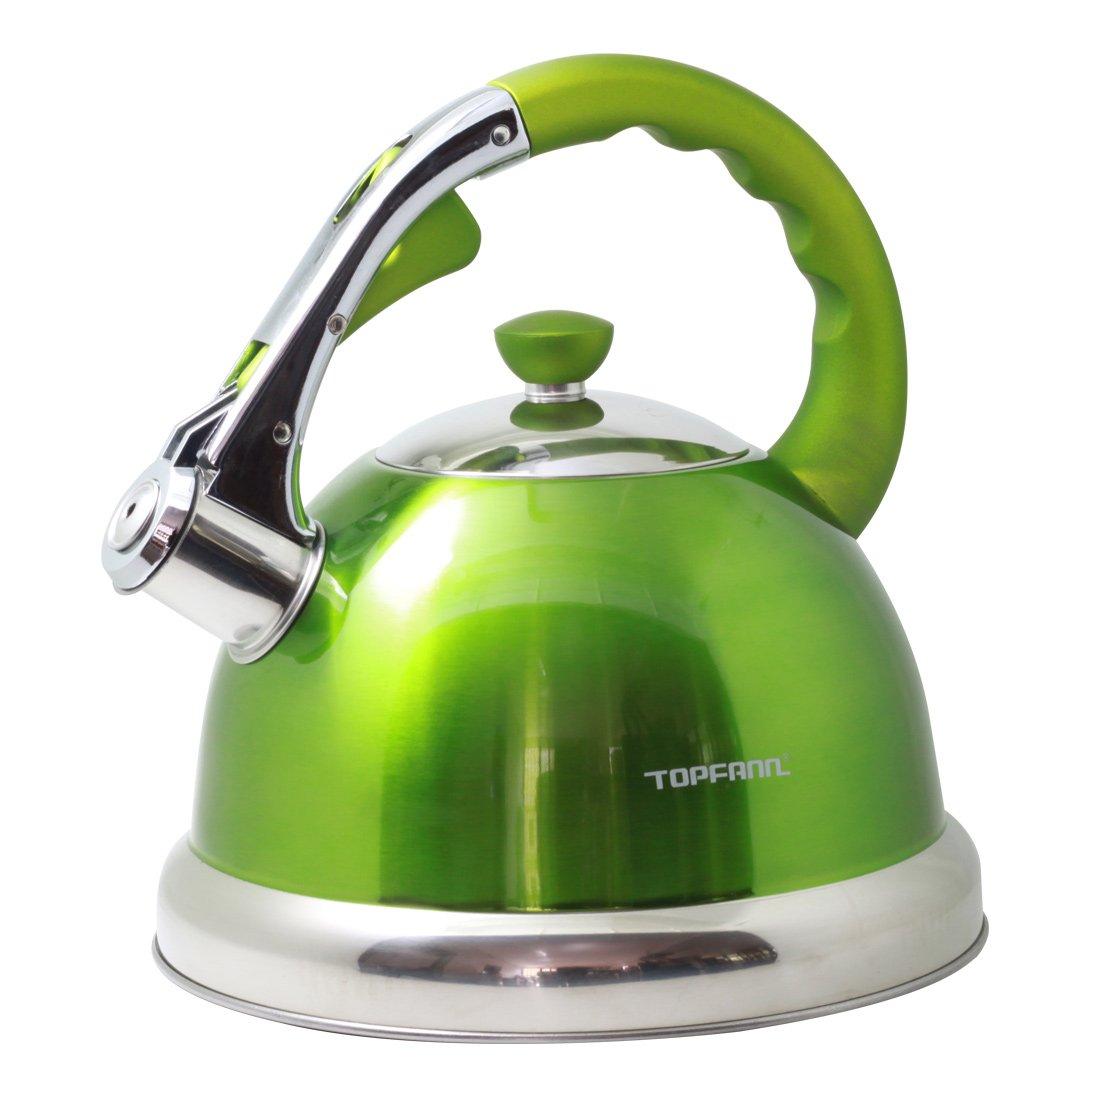 Riwendell 3.2 Quart Whistling Tea Kettle Stainless Steel Bell Shape StoveTop Teapot (GS-04555HY-3L, Green)